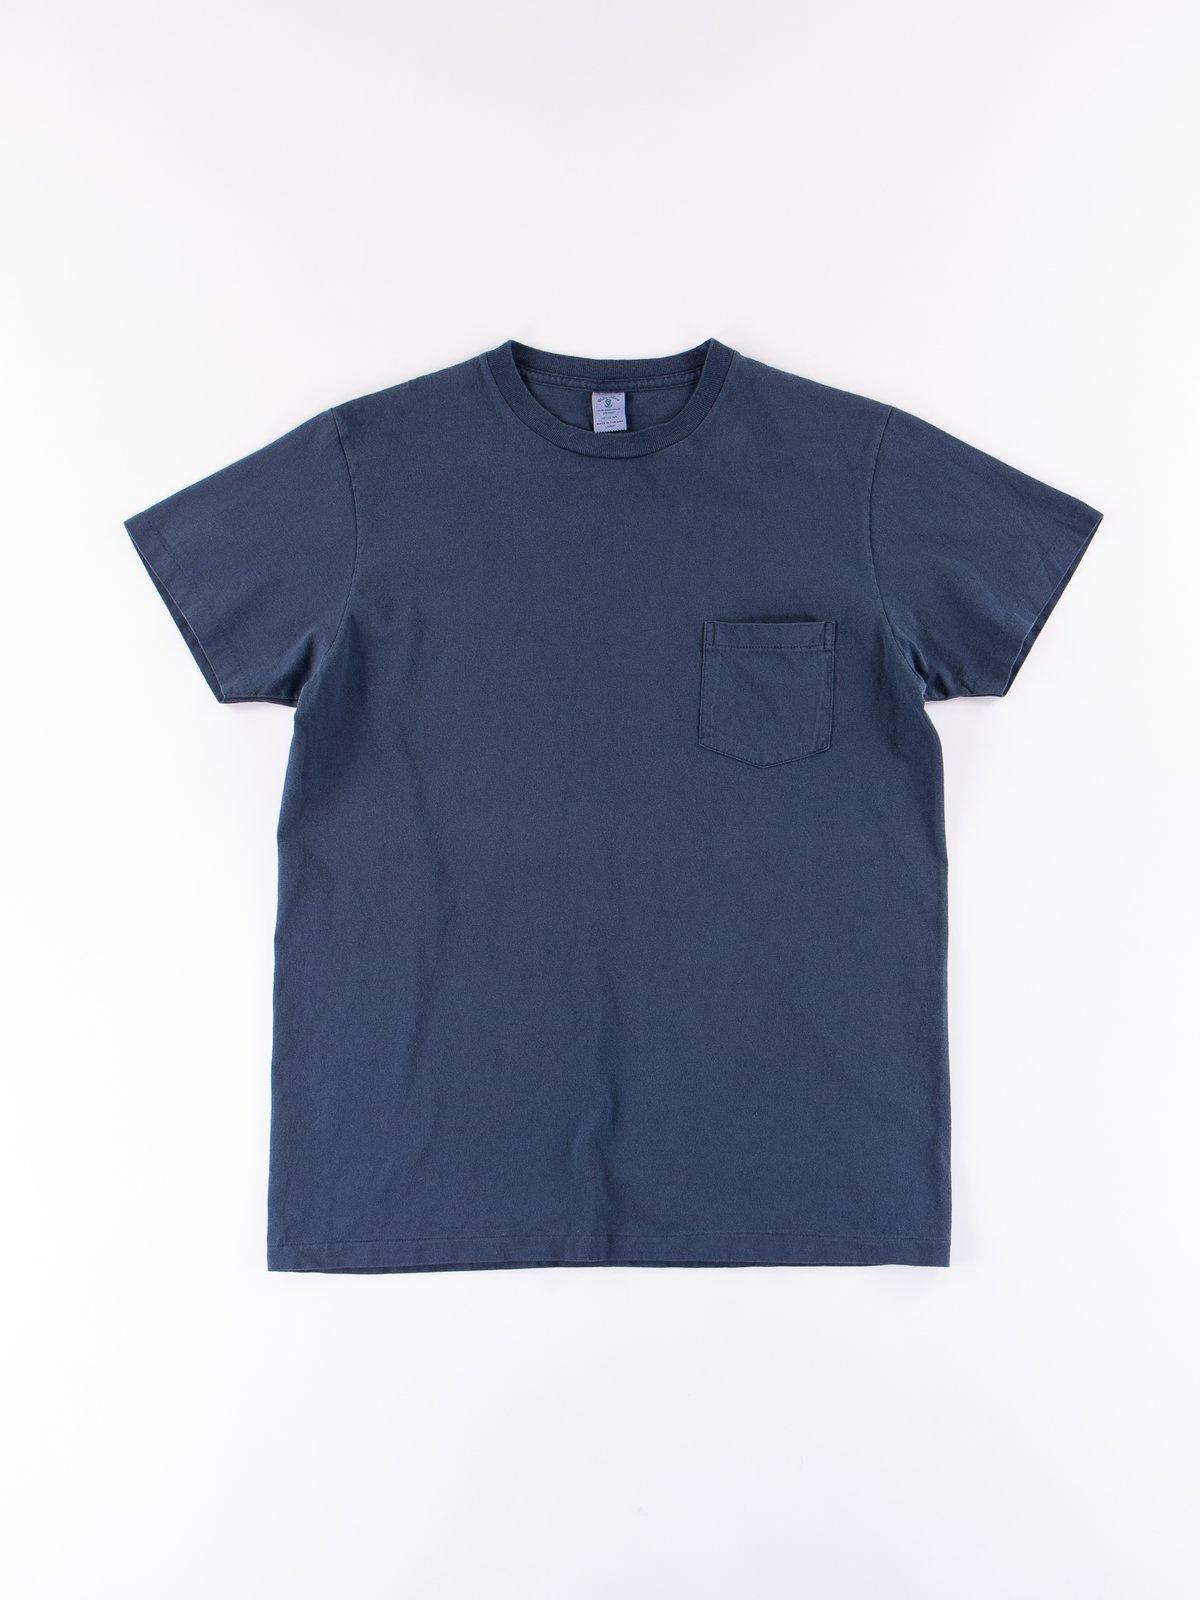 Navy Pigment Dye Pocket Tee - Image 1